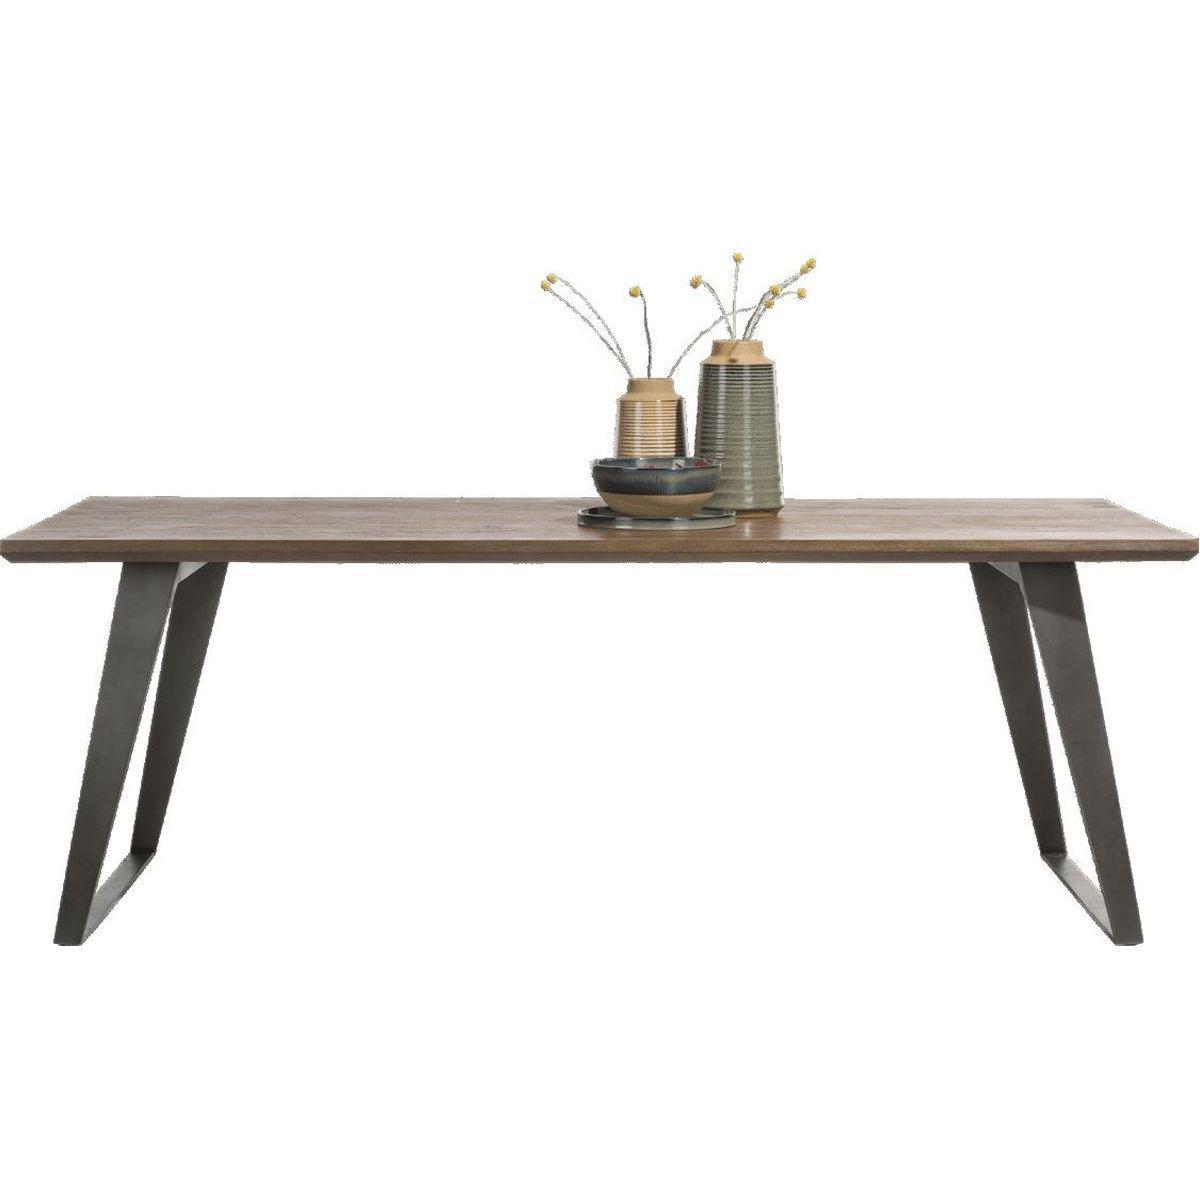 Table BOX HetH 100x220cm Tramwood Walnut